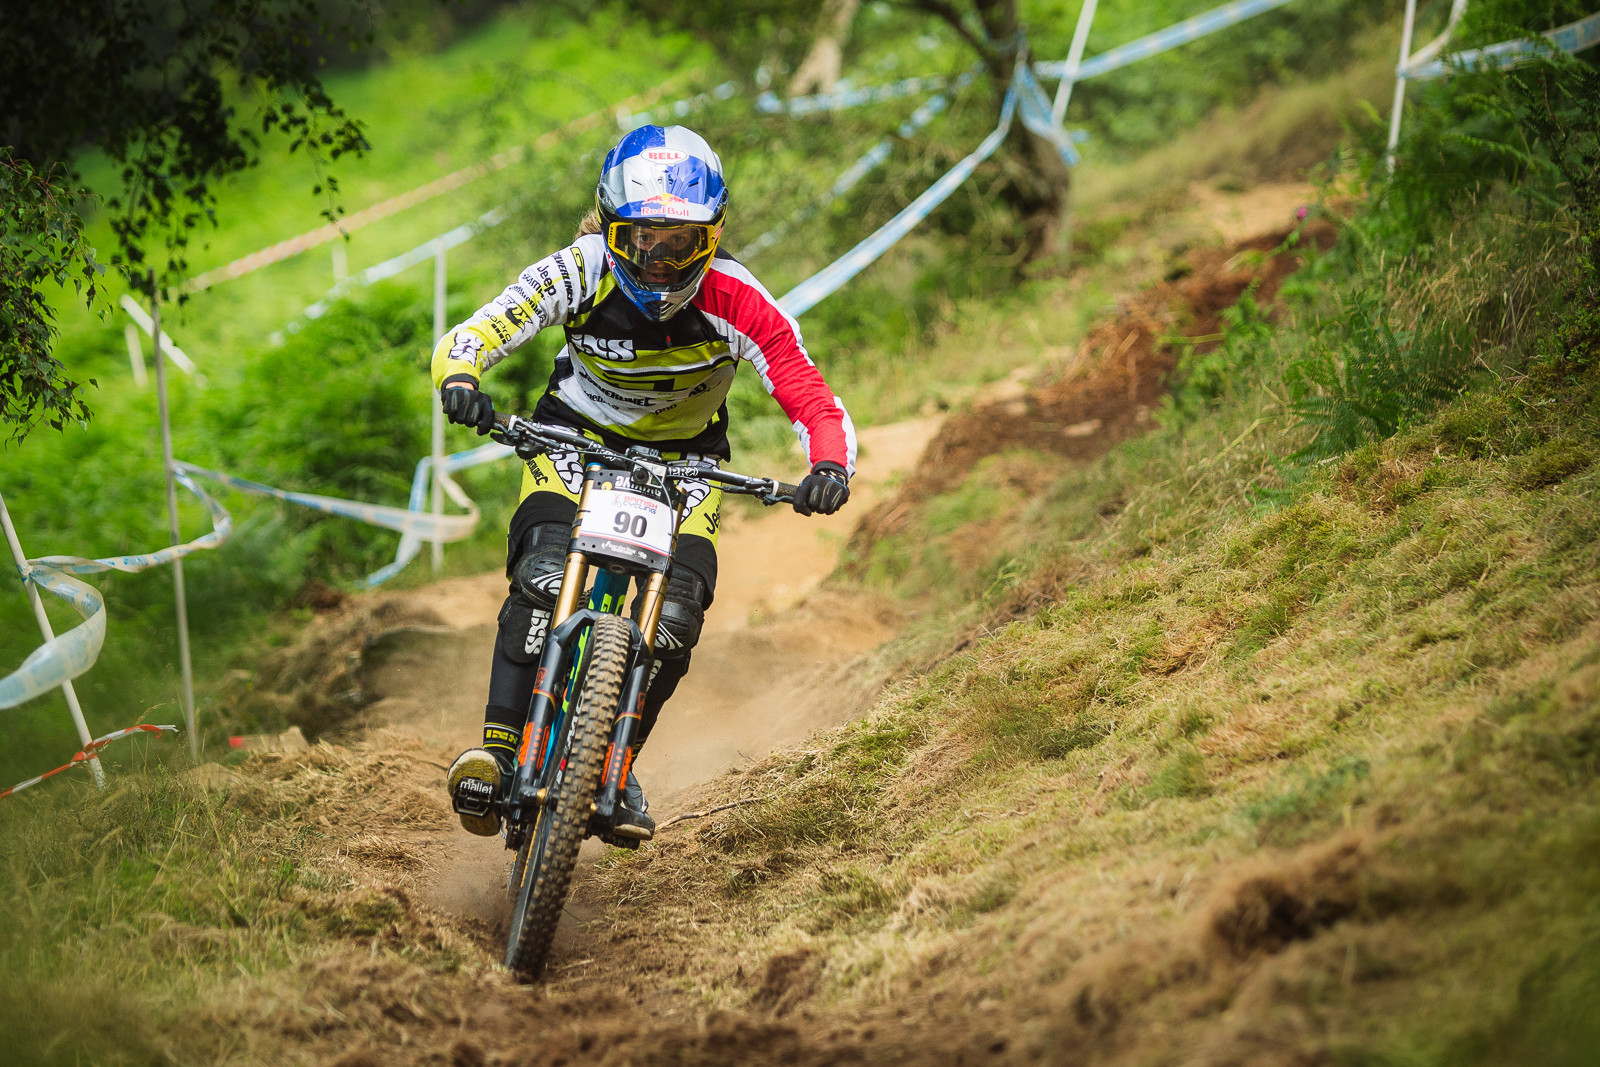 Rachel Atherton, 1st Place - 2015 British National Champs Downhill - 2015 British National Champs Downhill Photos - Mountain Biking Pictures - Vital MTB